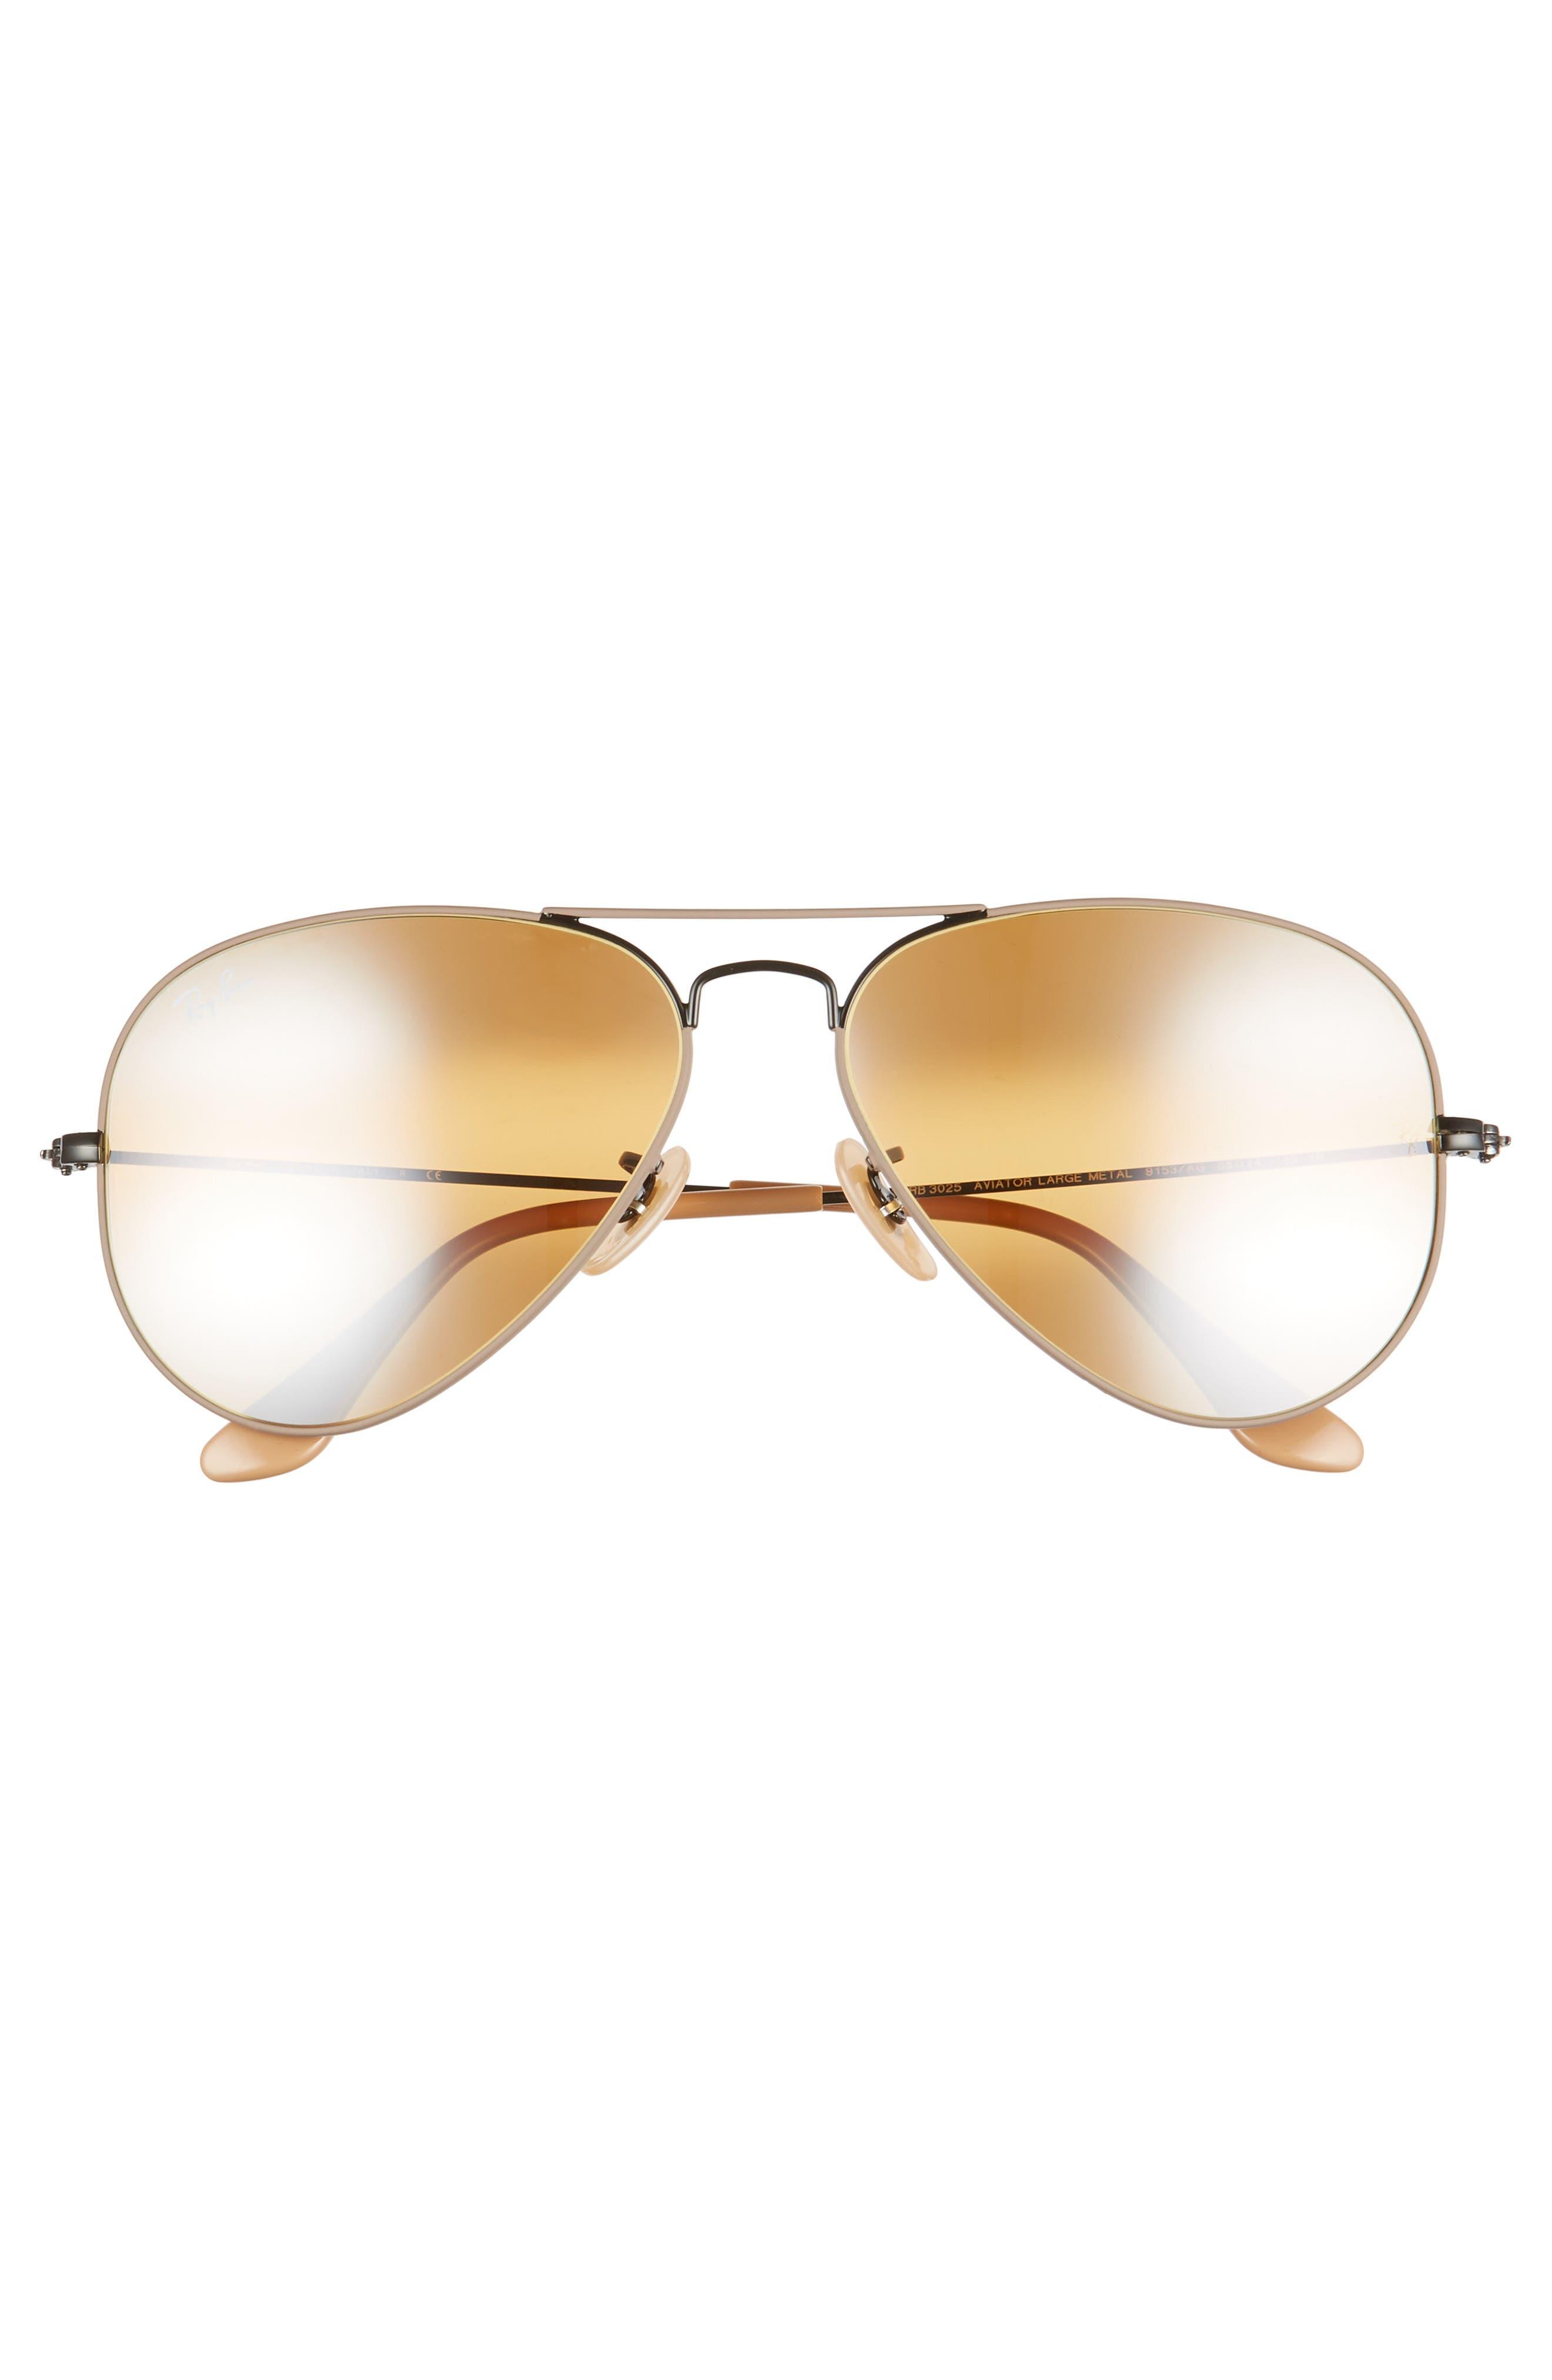 RAY-BAN,                             Standard Original 58mm Aviator Sunglasses,                             Alternate thumbnail 3, color,                             BEIGE/ BLACK MIRROR